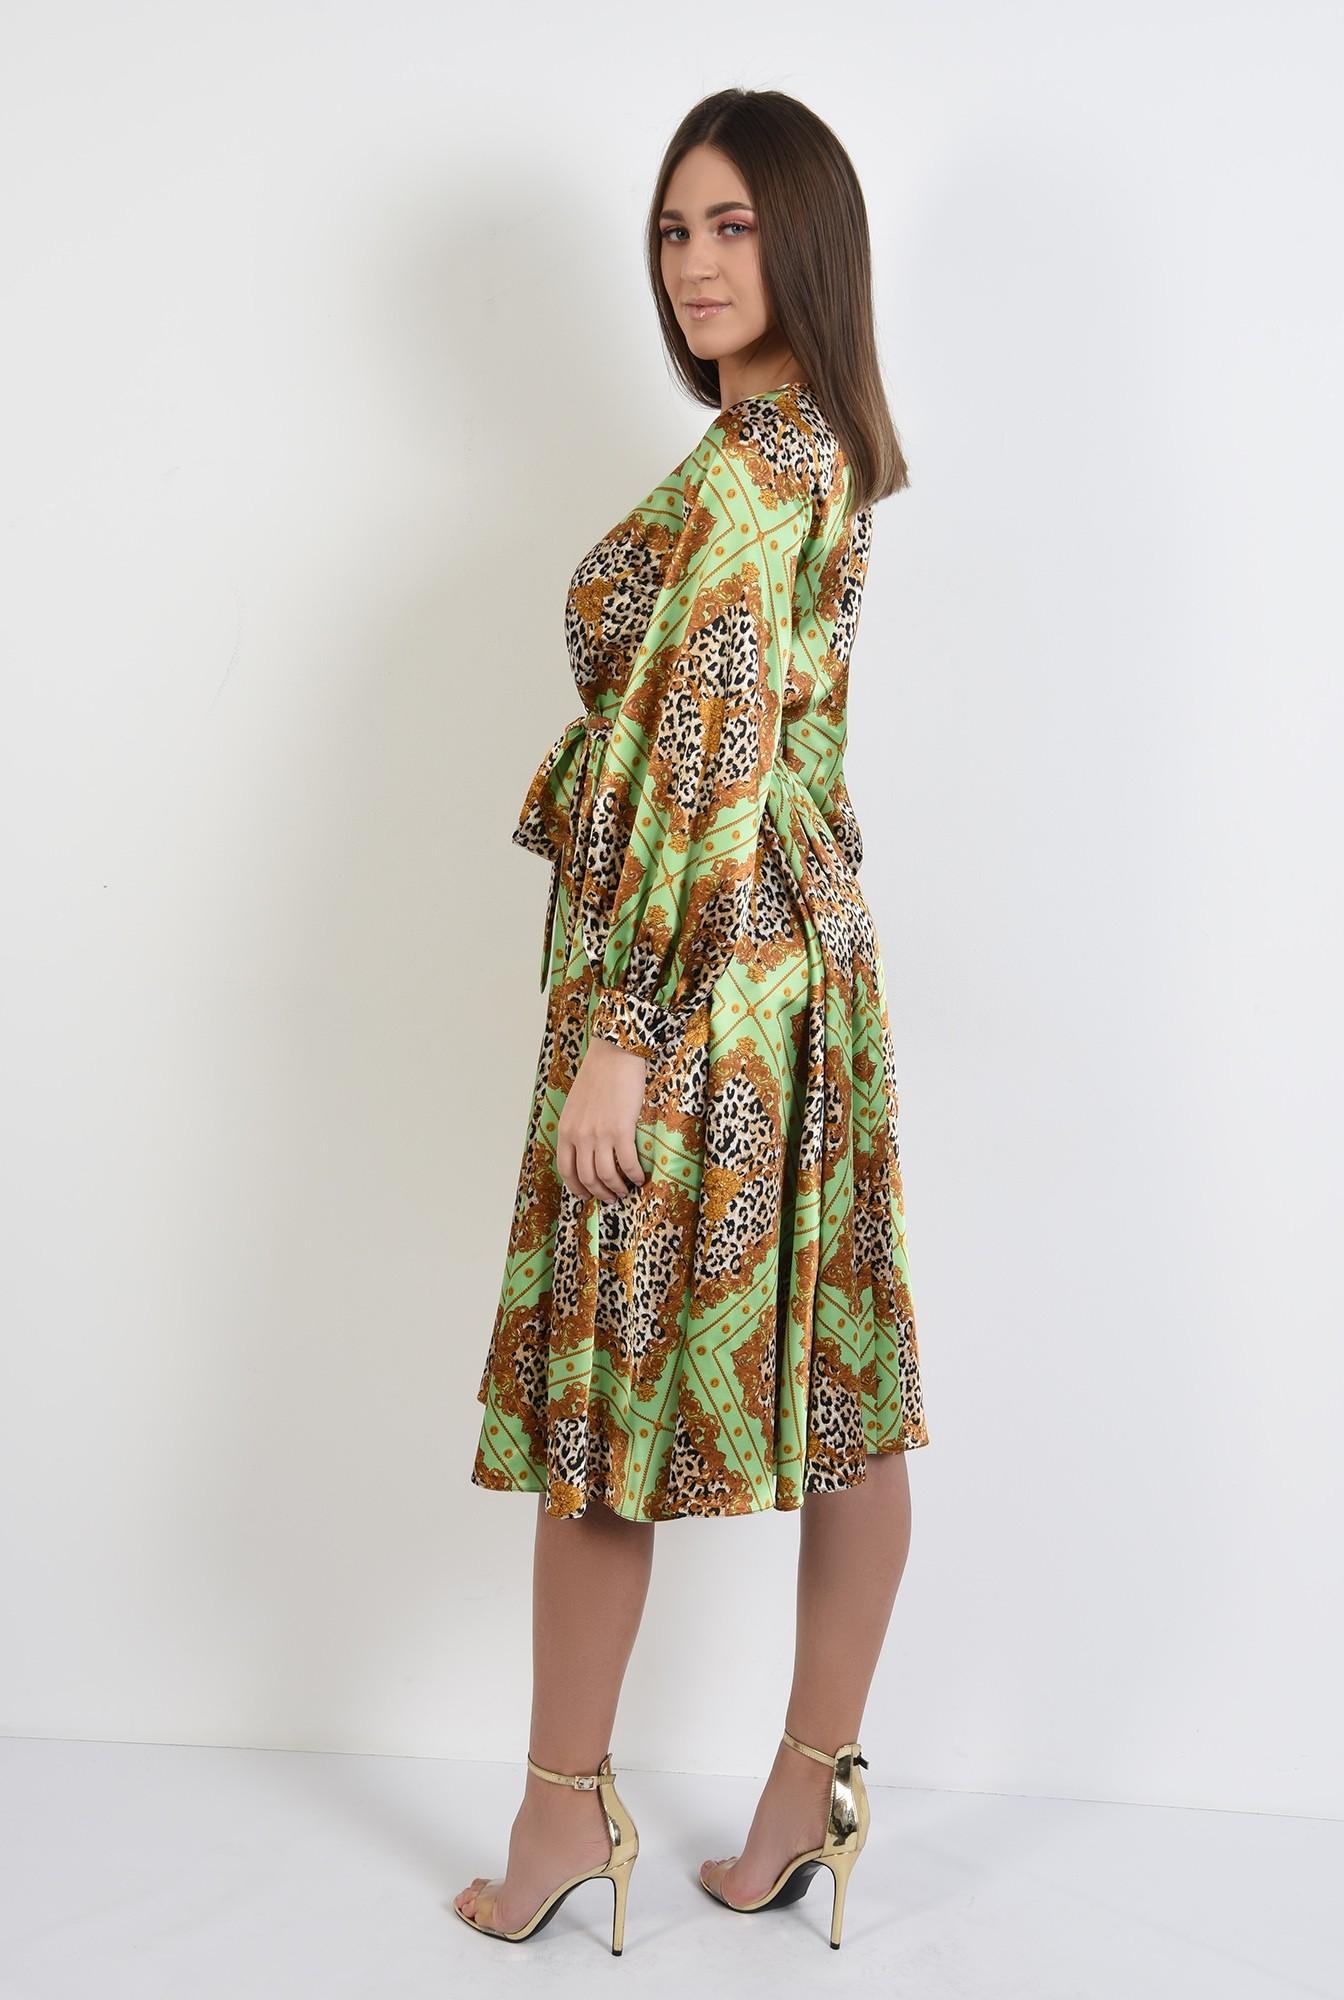 1 - 360 - rochie eleganta, din satin, cu imprimeu, maneci bufante, clos, animal print